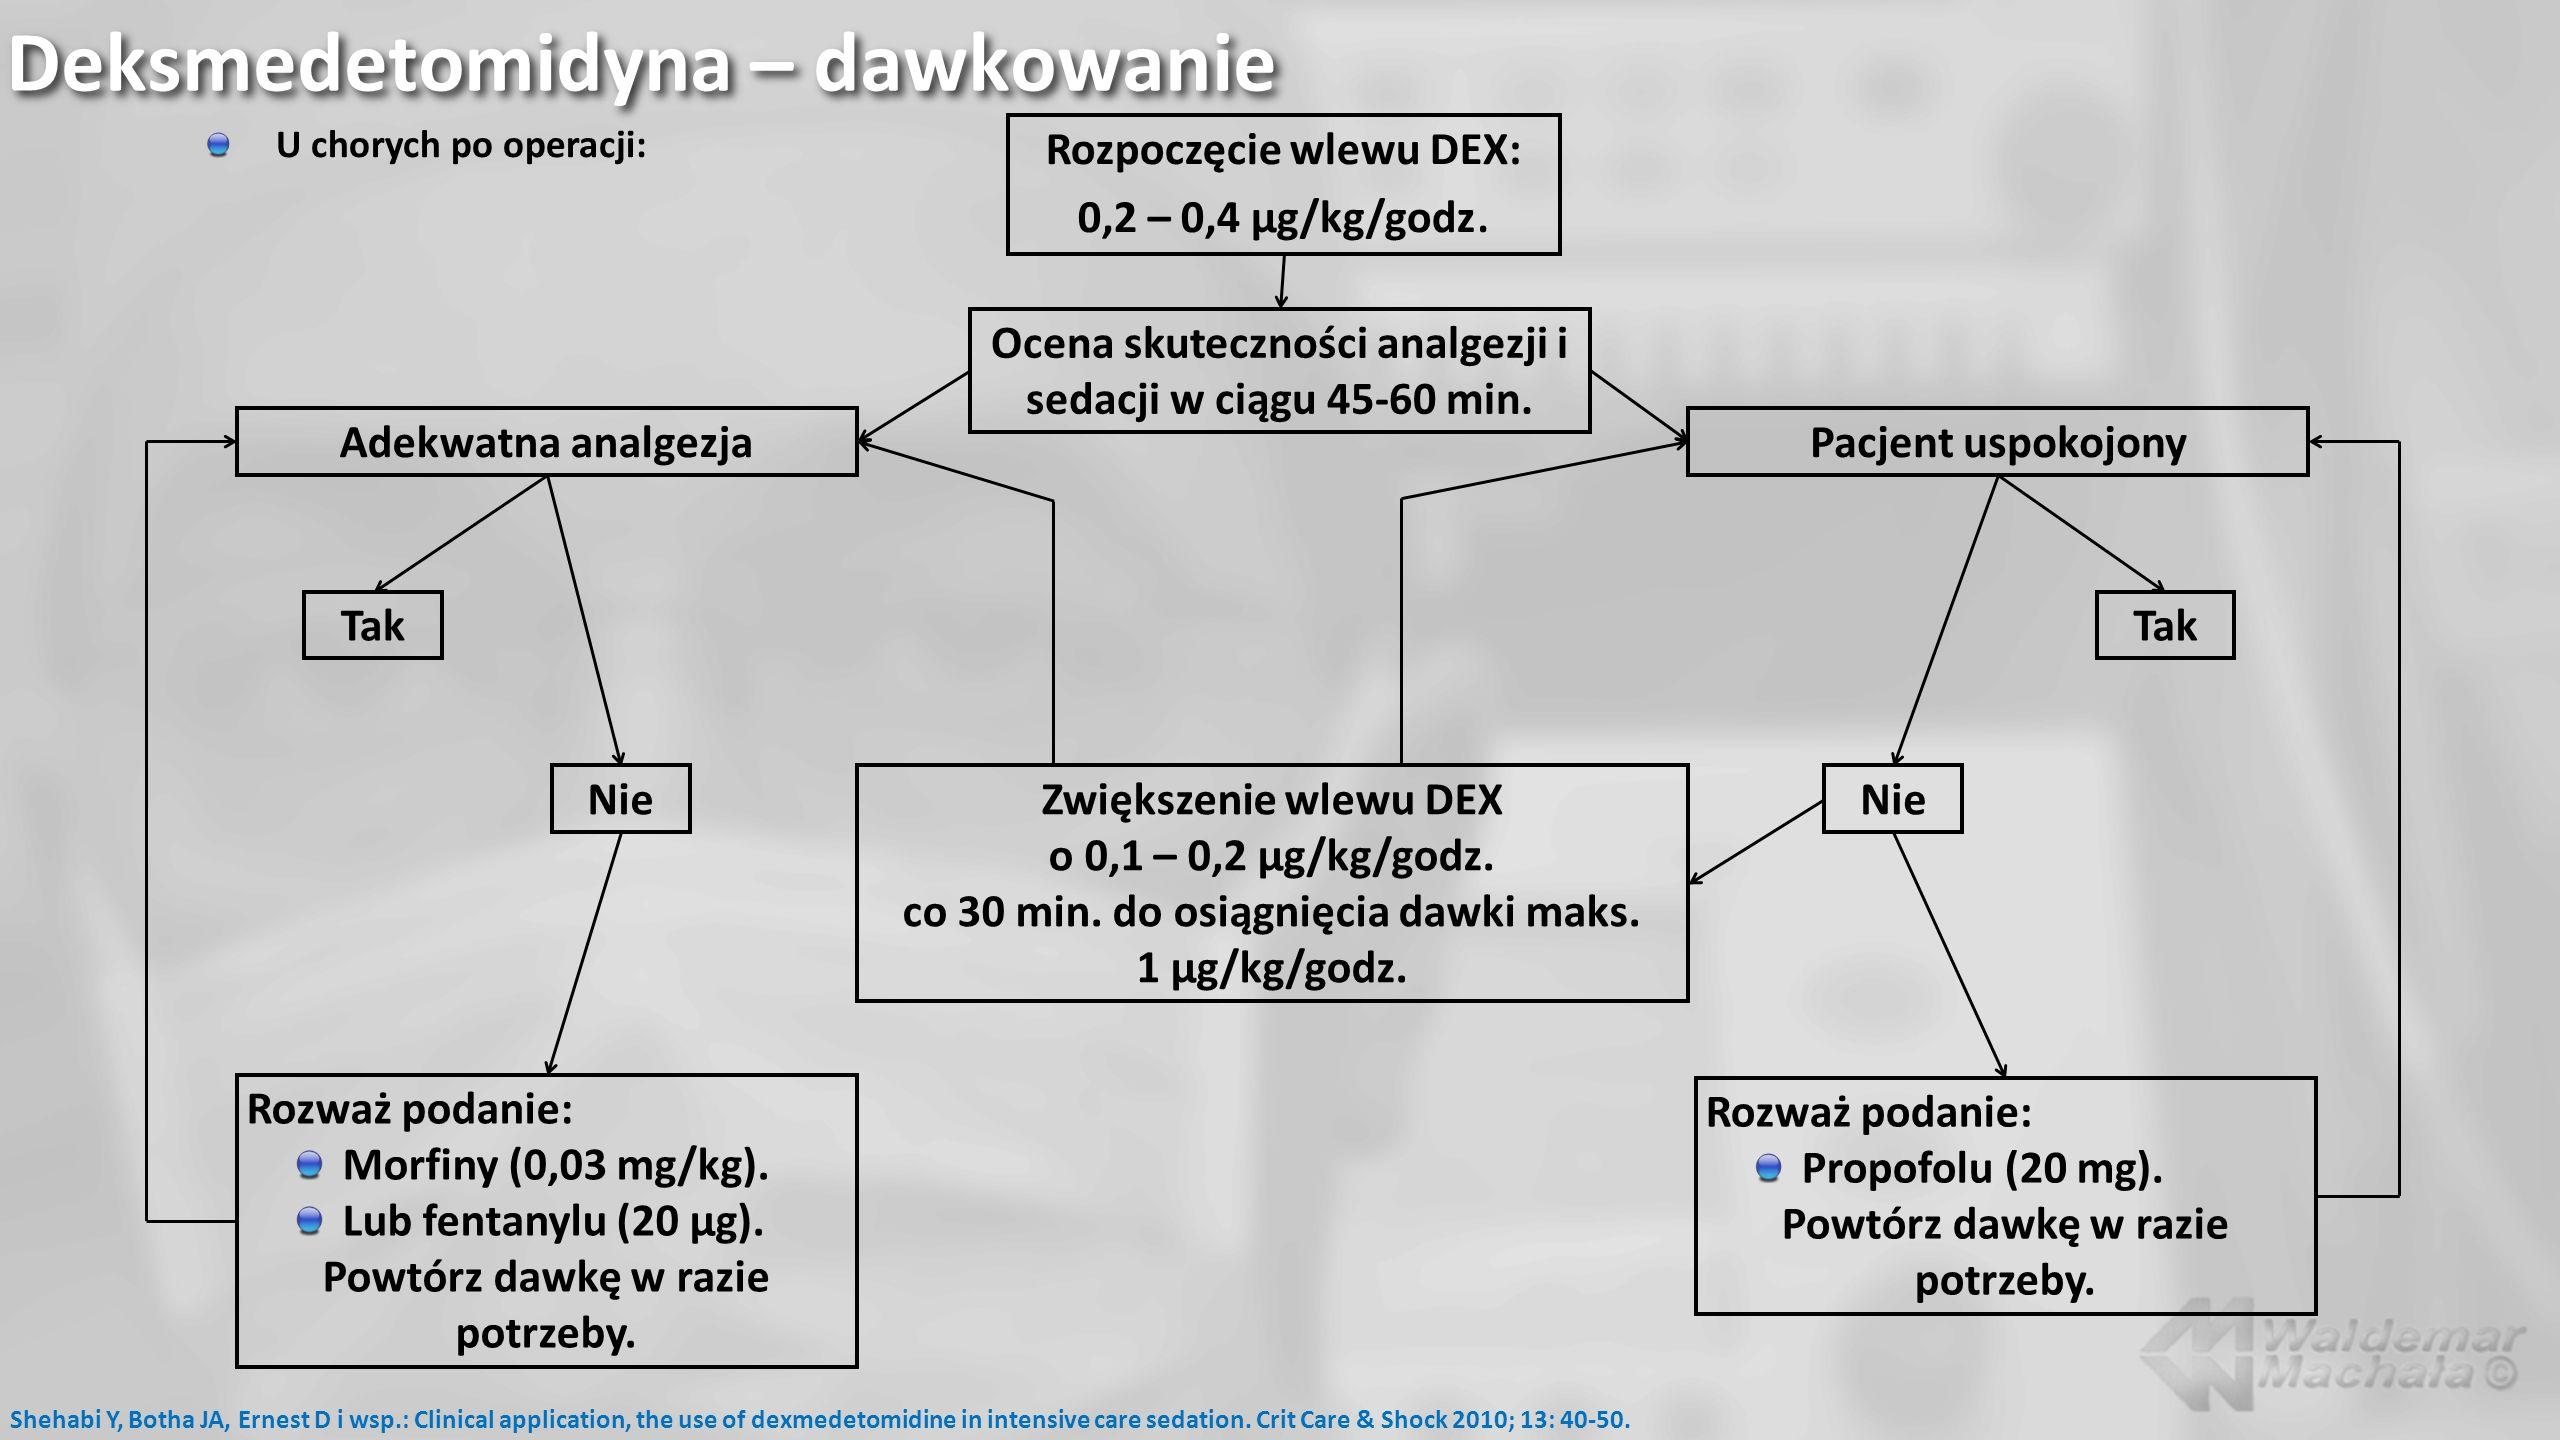 Deksmedetomidyna – dawkowanie U chorych po operacji: Shehabi Y, Botha JA, Ernest D i wsp.: Clinical application, the use of dexmedetomidine in intensi